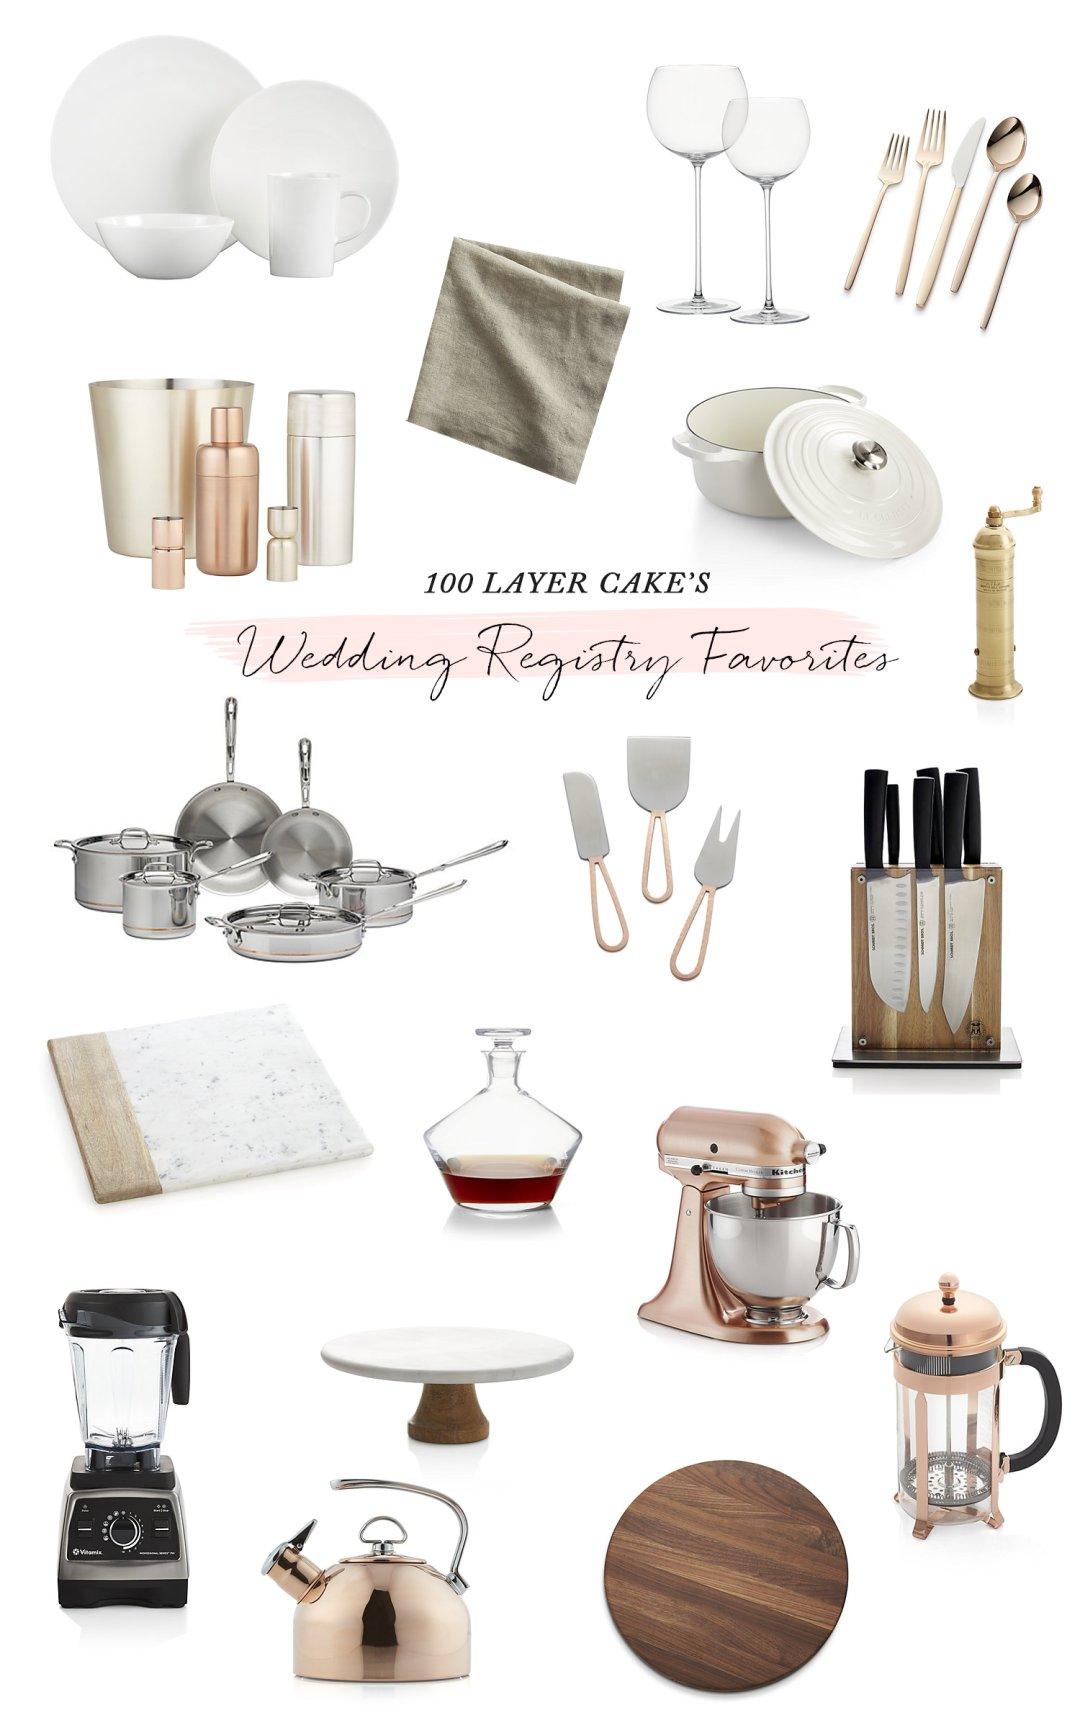 100 Layer Cake wedding gift registry picks